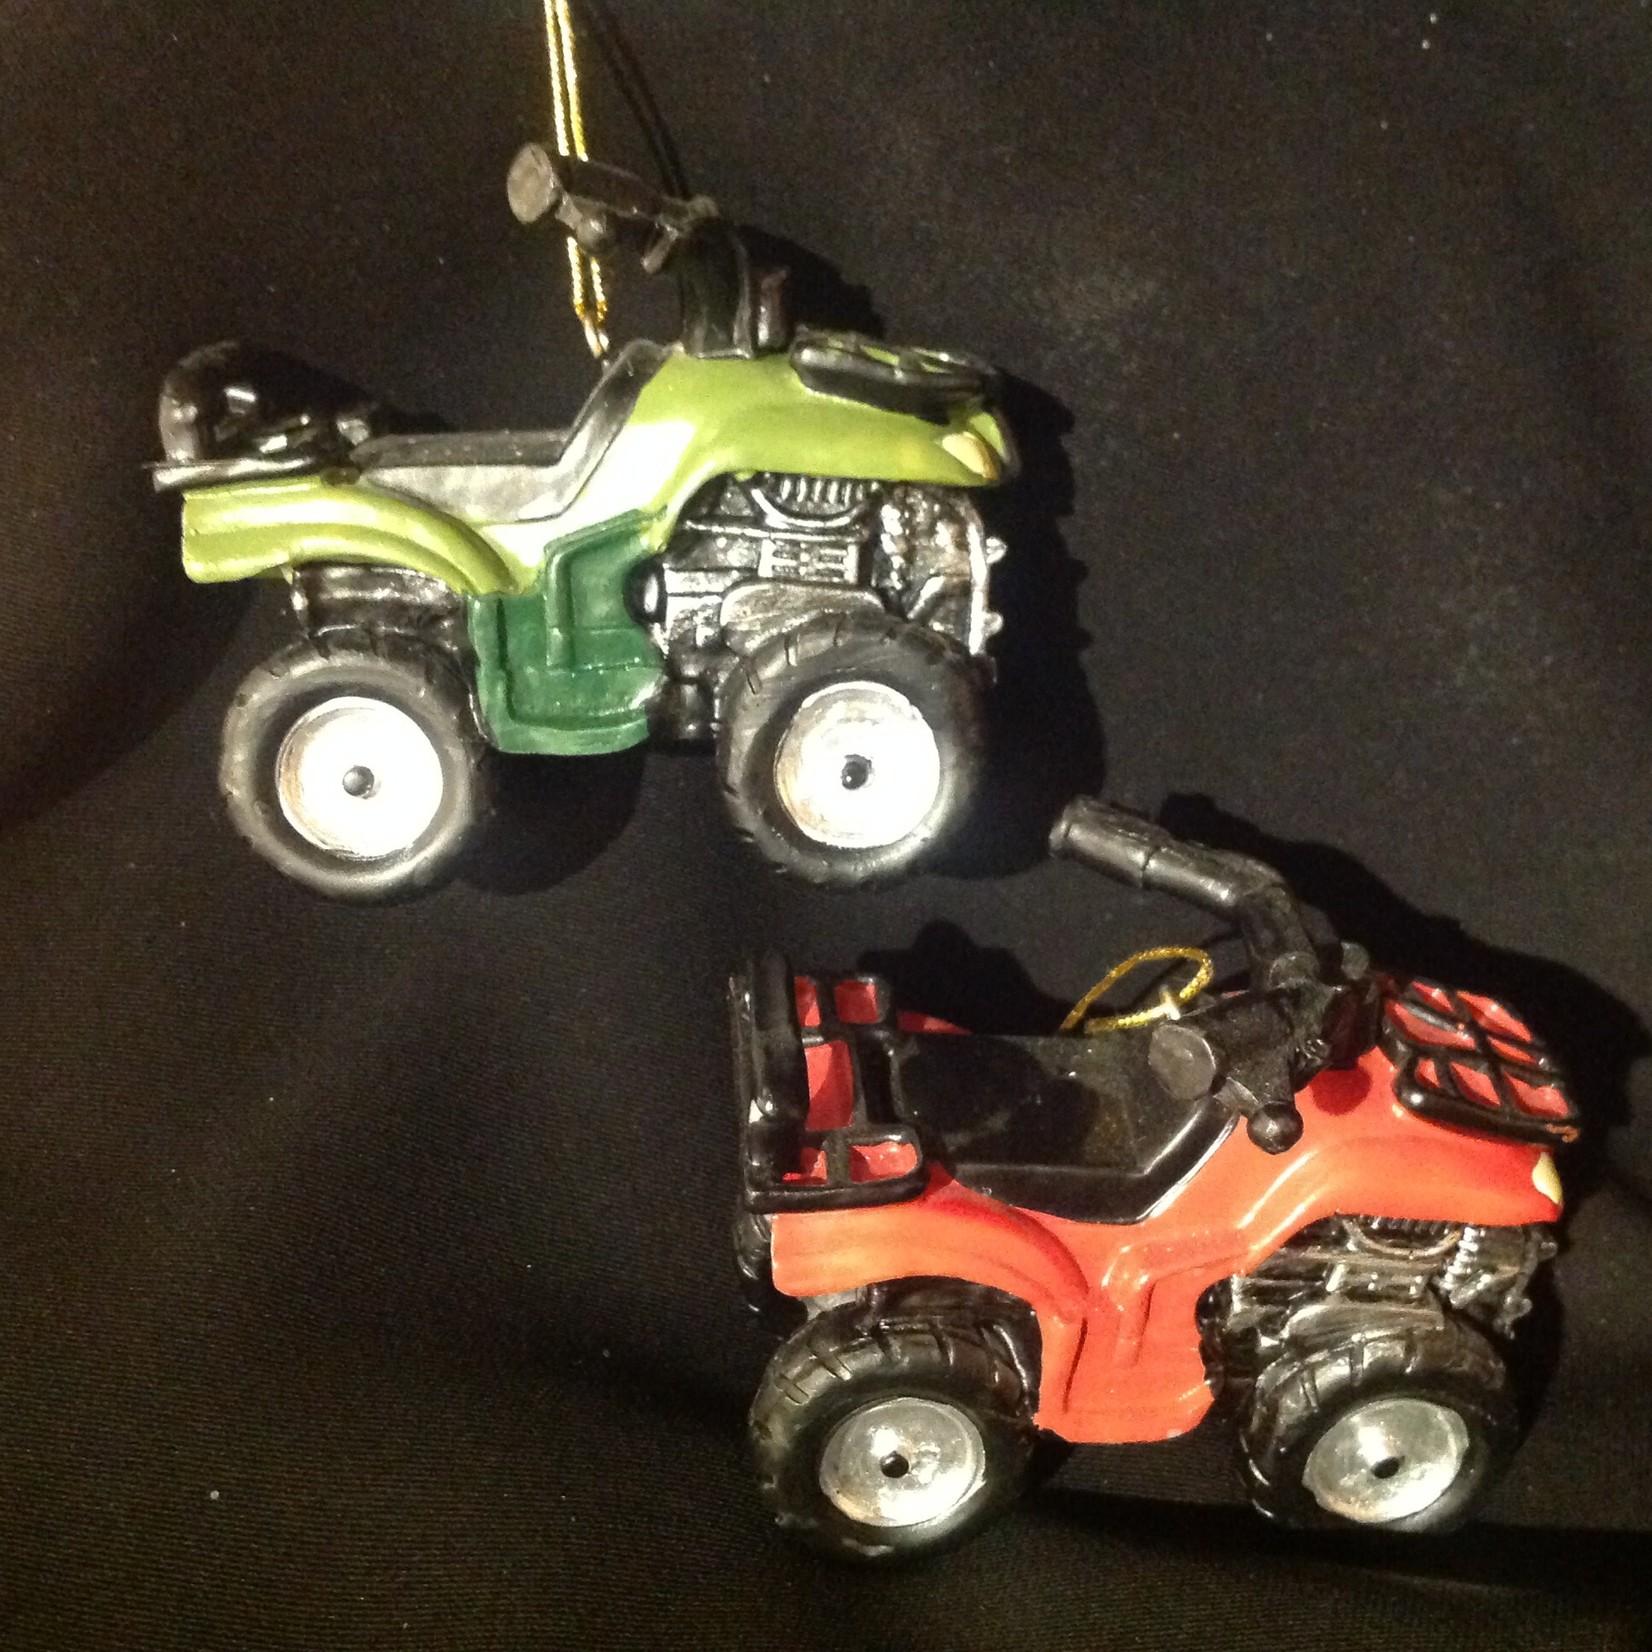 ATV Vehicle Orn 2A